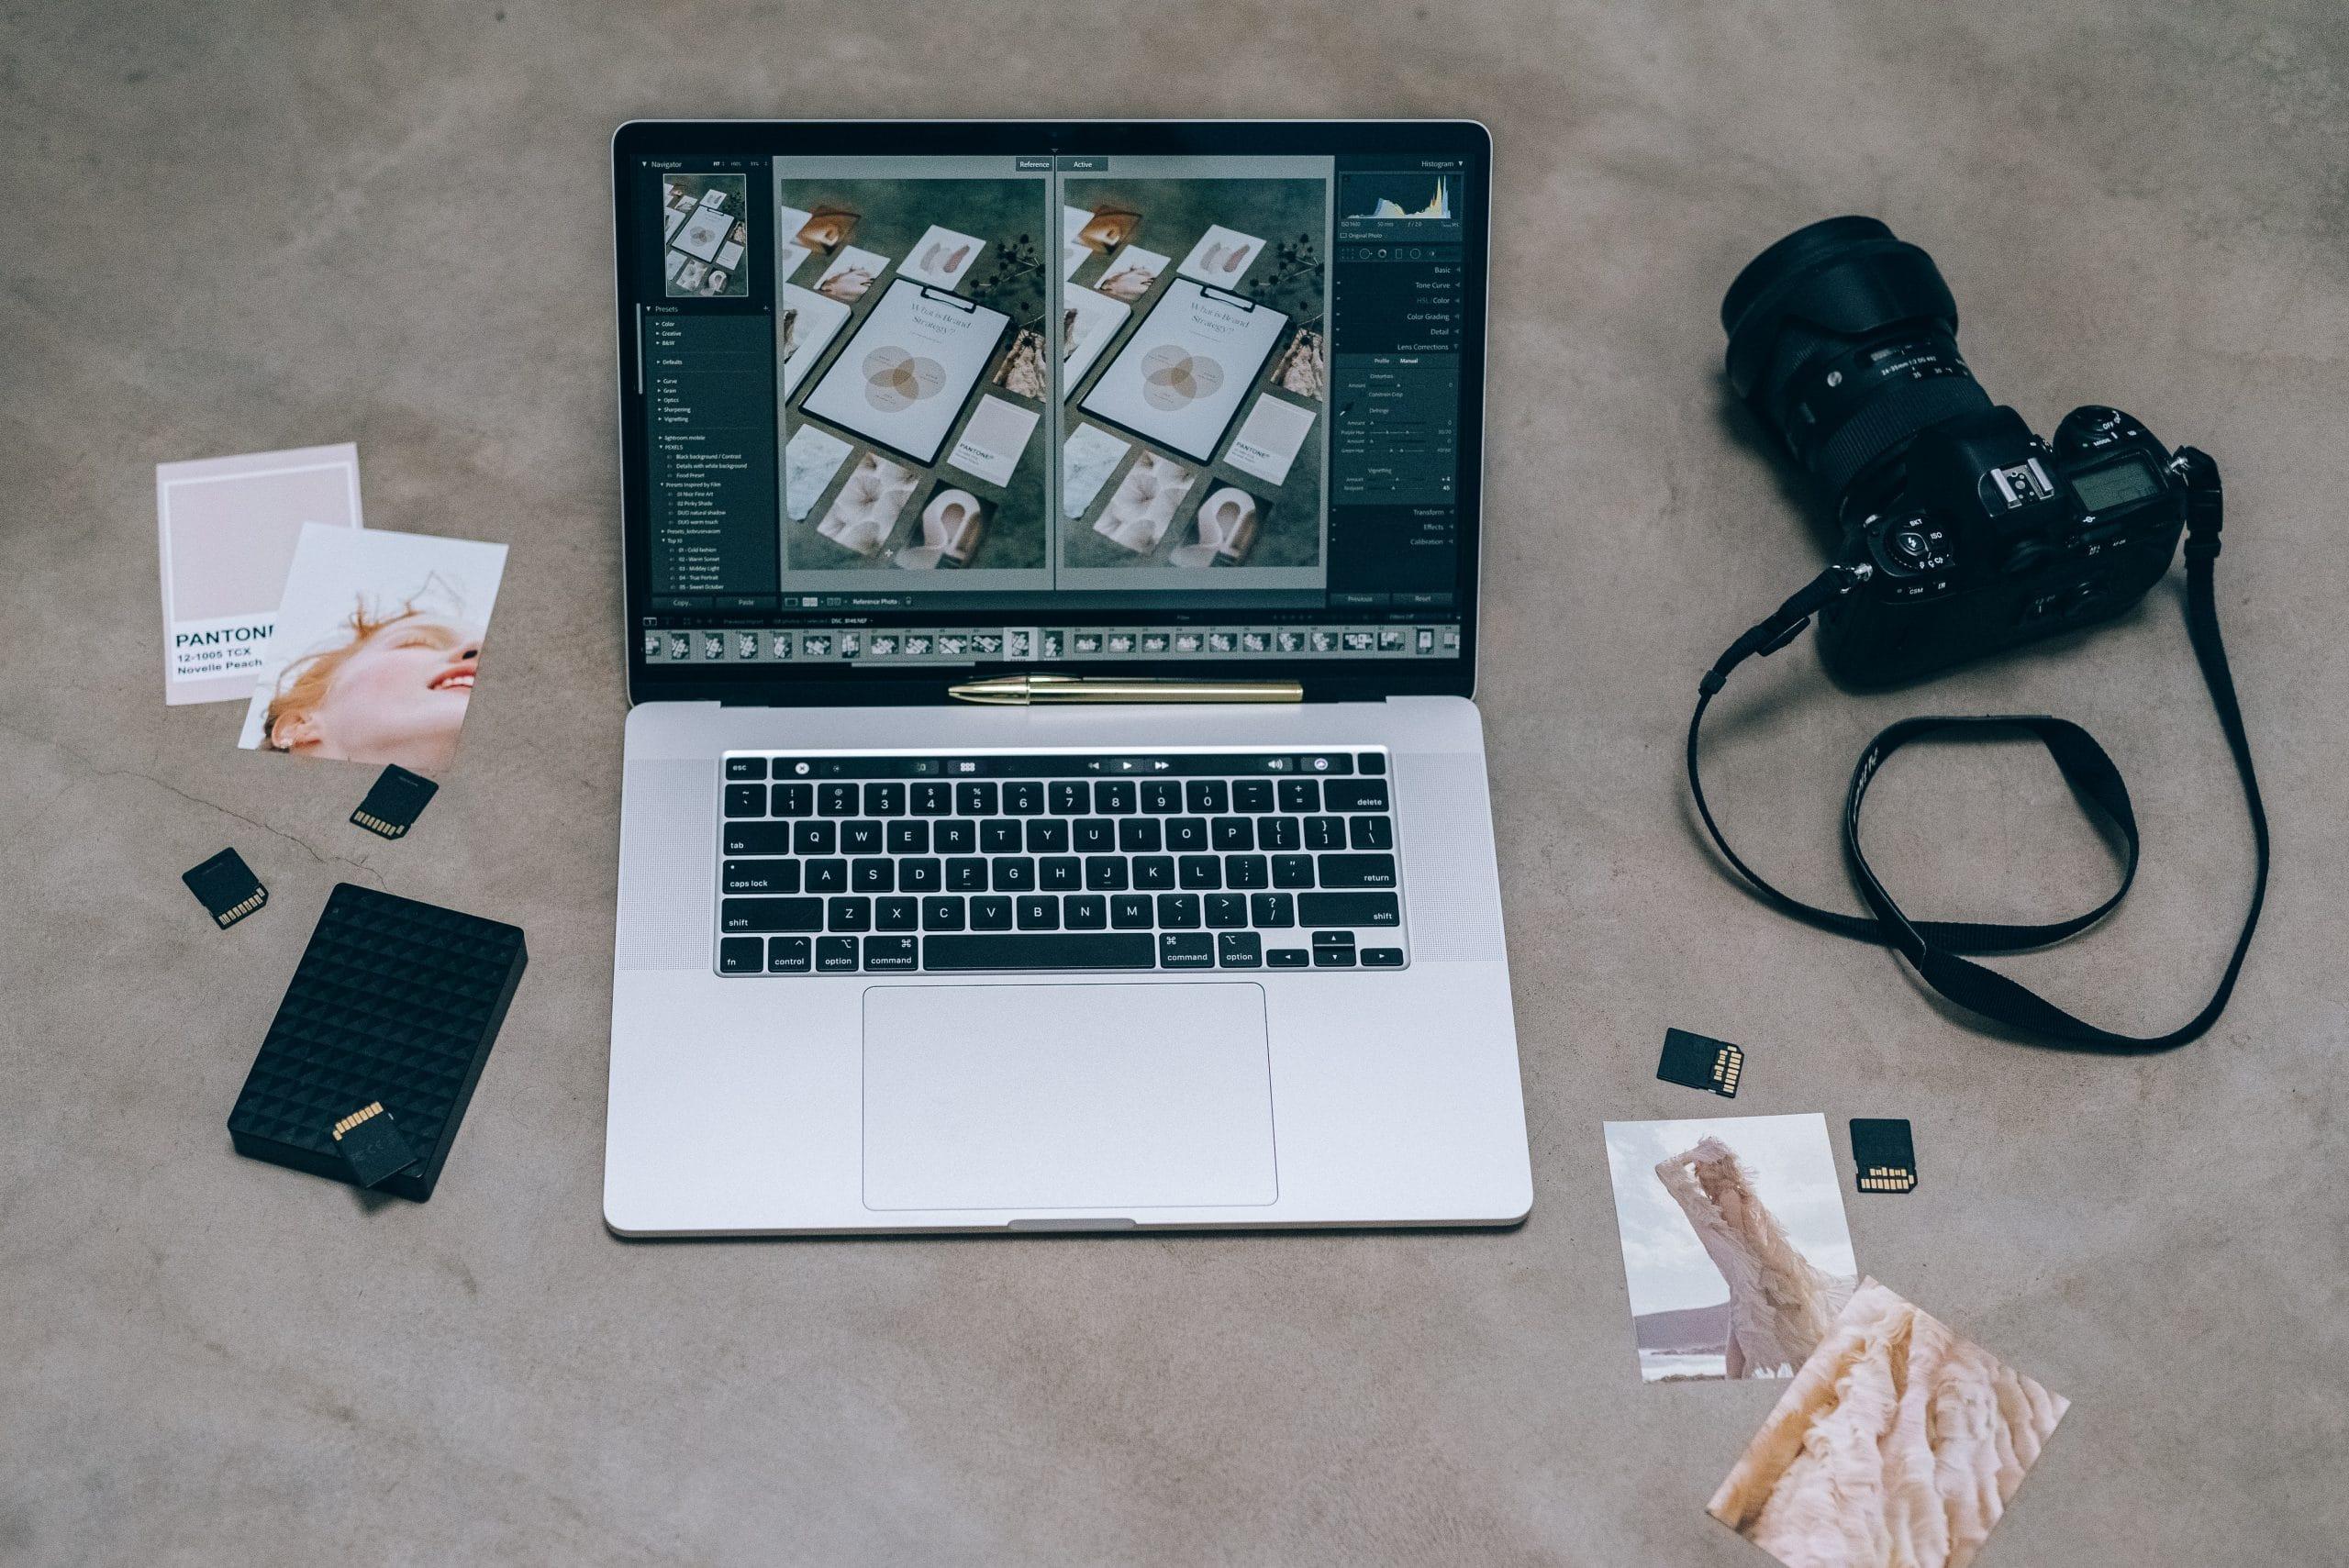 Lightroom on laptop - How to Install Lightroom Presets